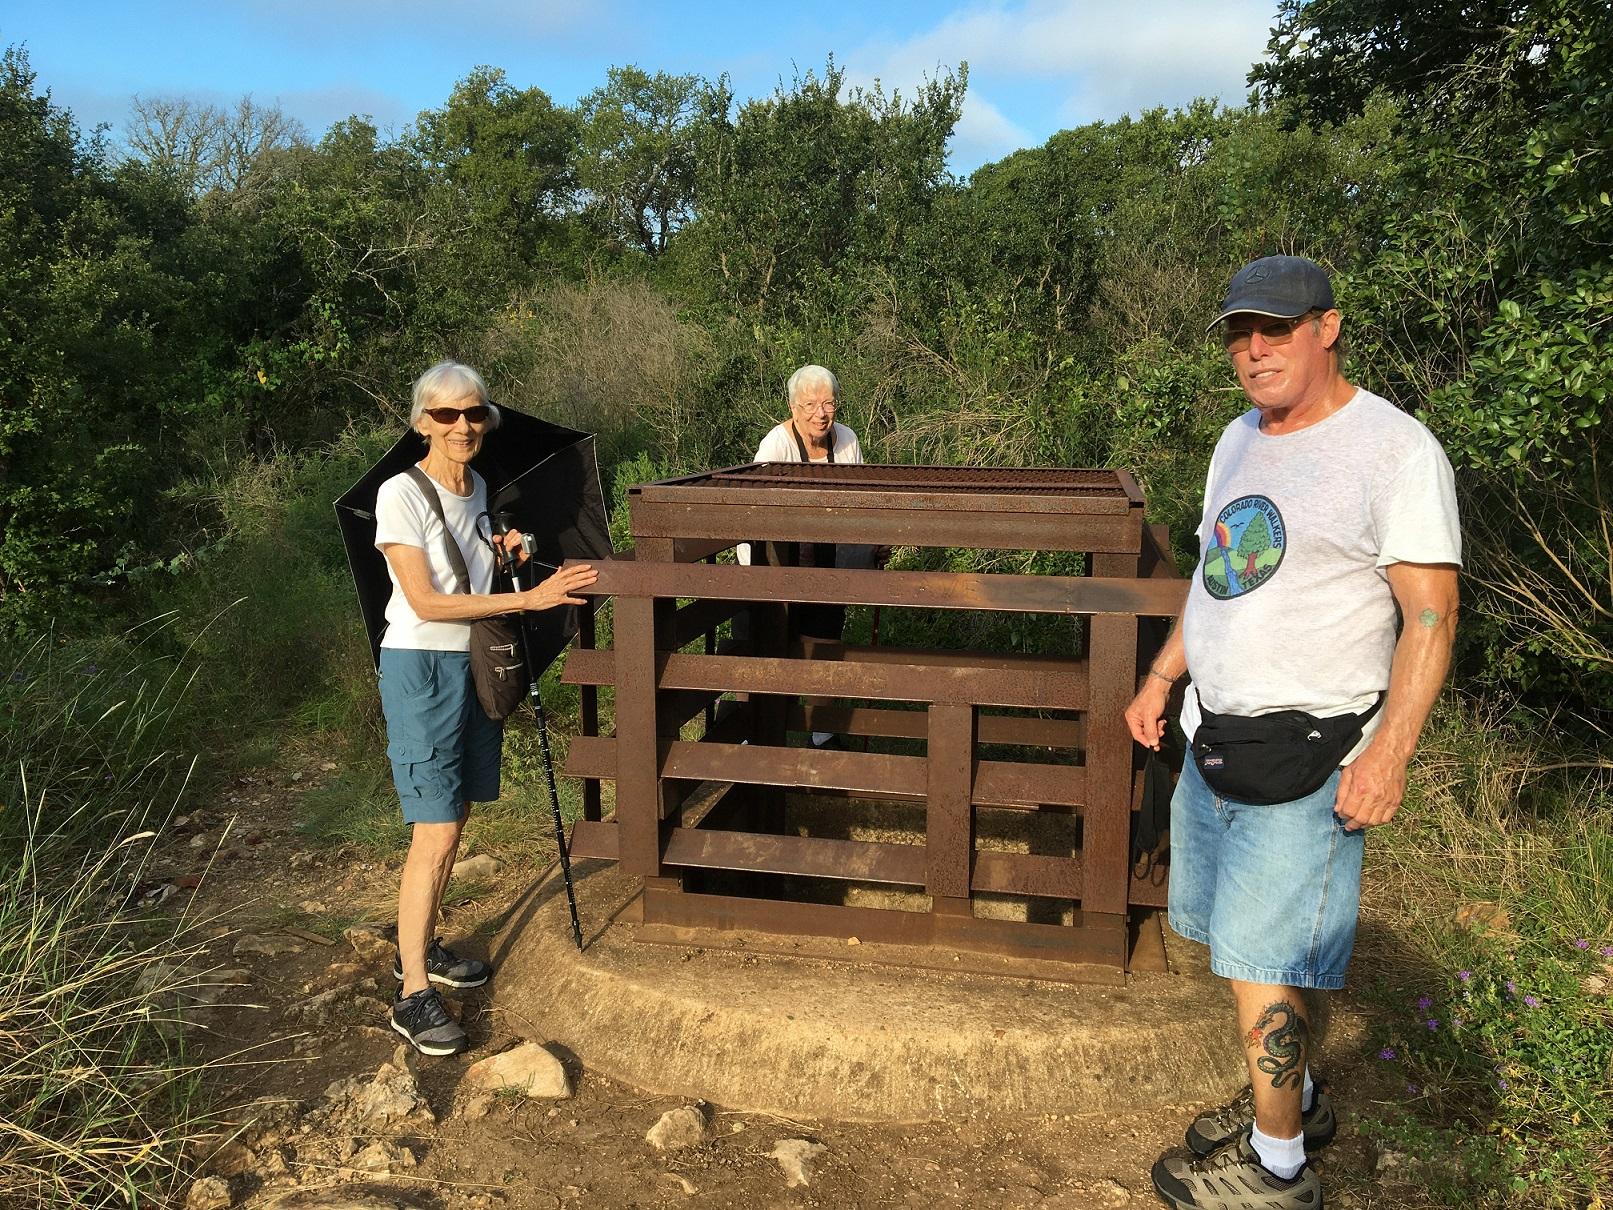 Violet Crown Trail via Dick Nichols Park Walk on Sep 25th